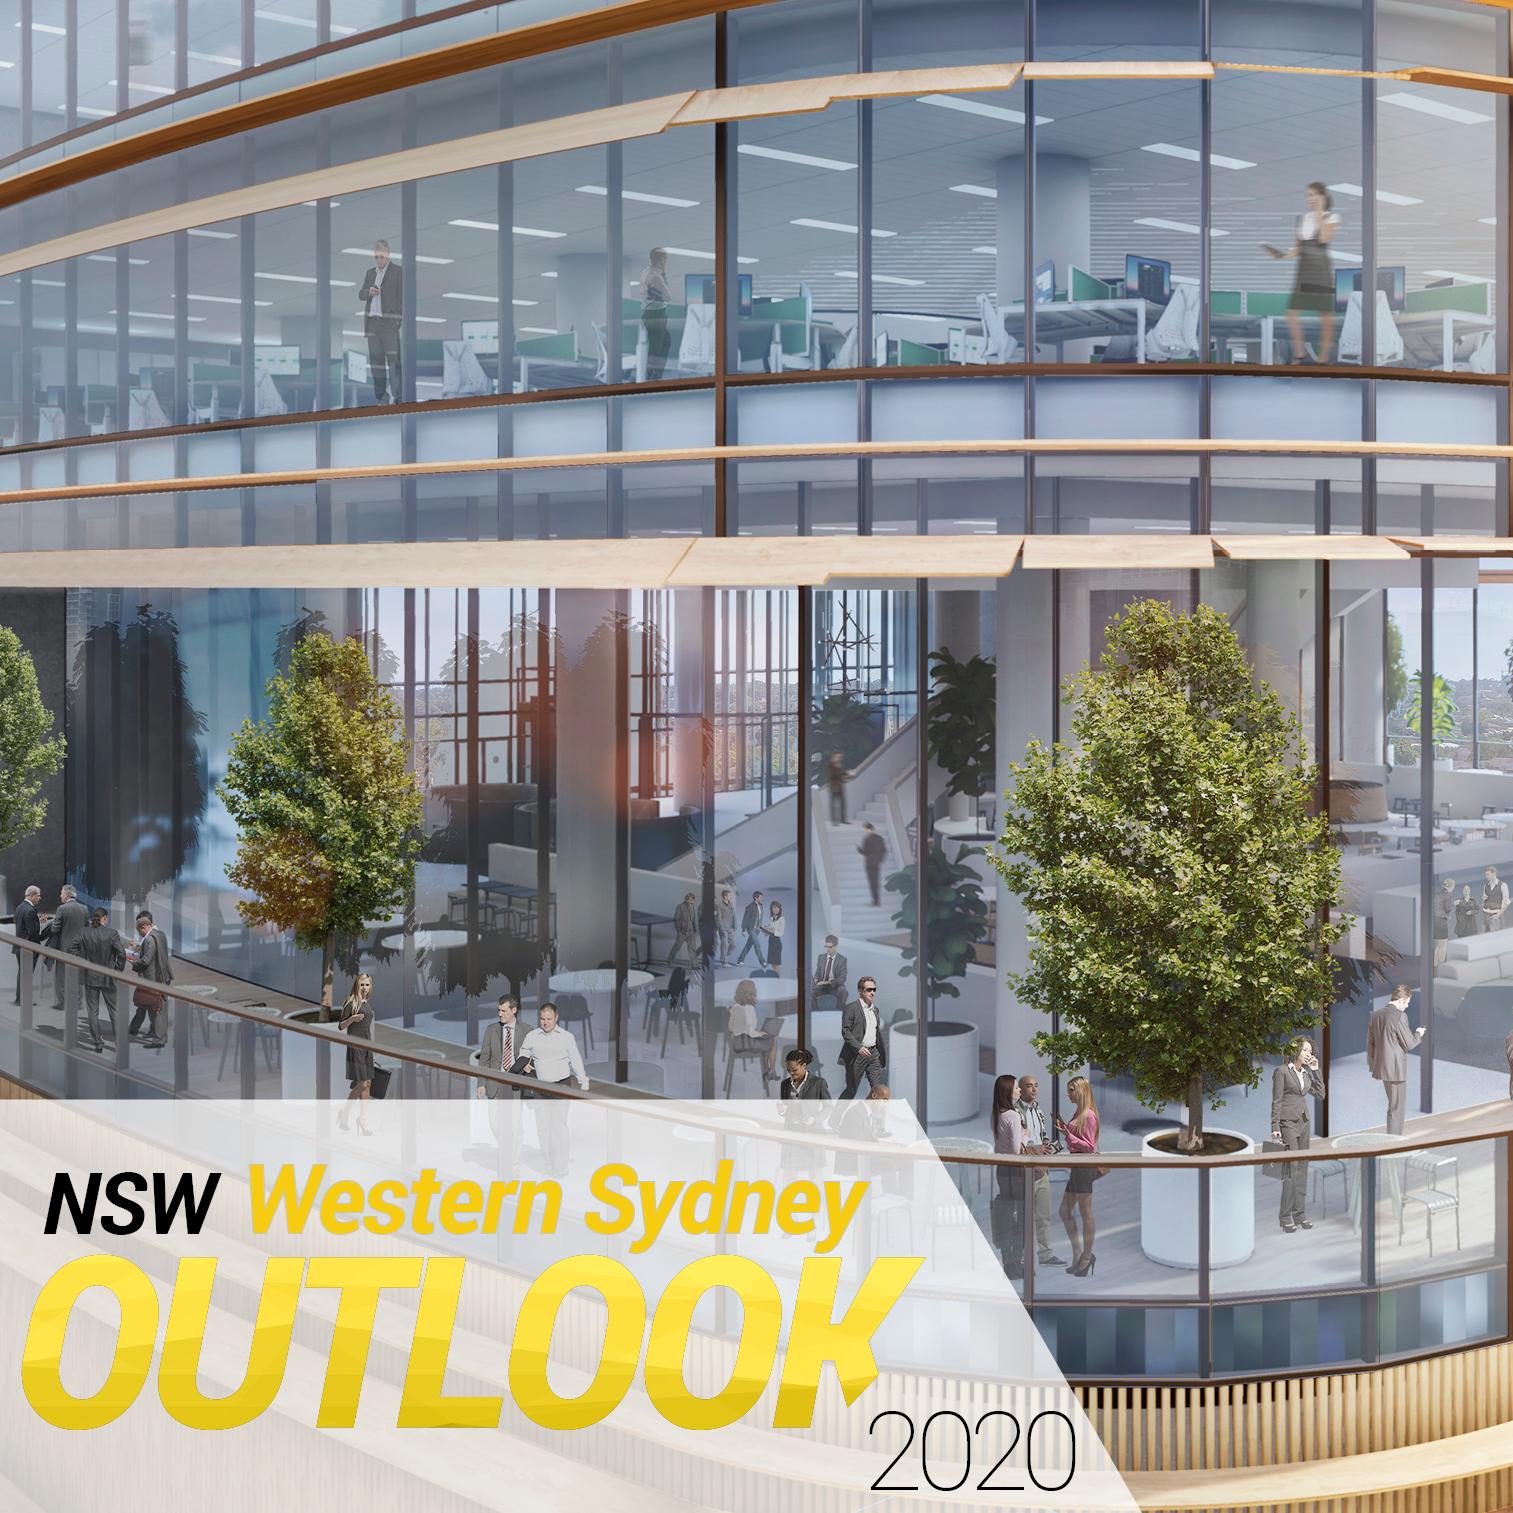 Western Sydney Webtile